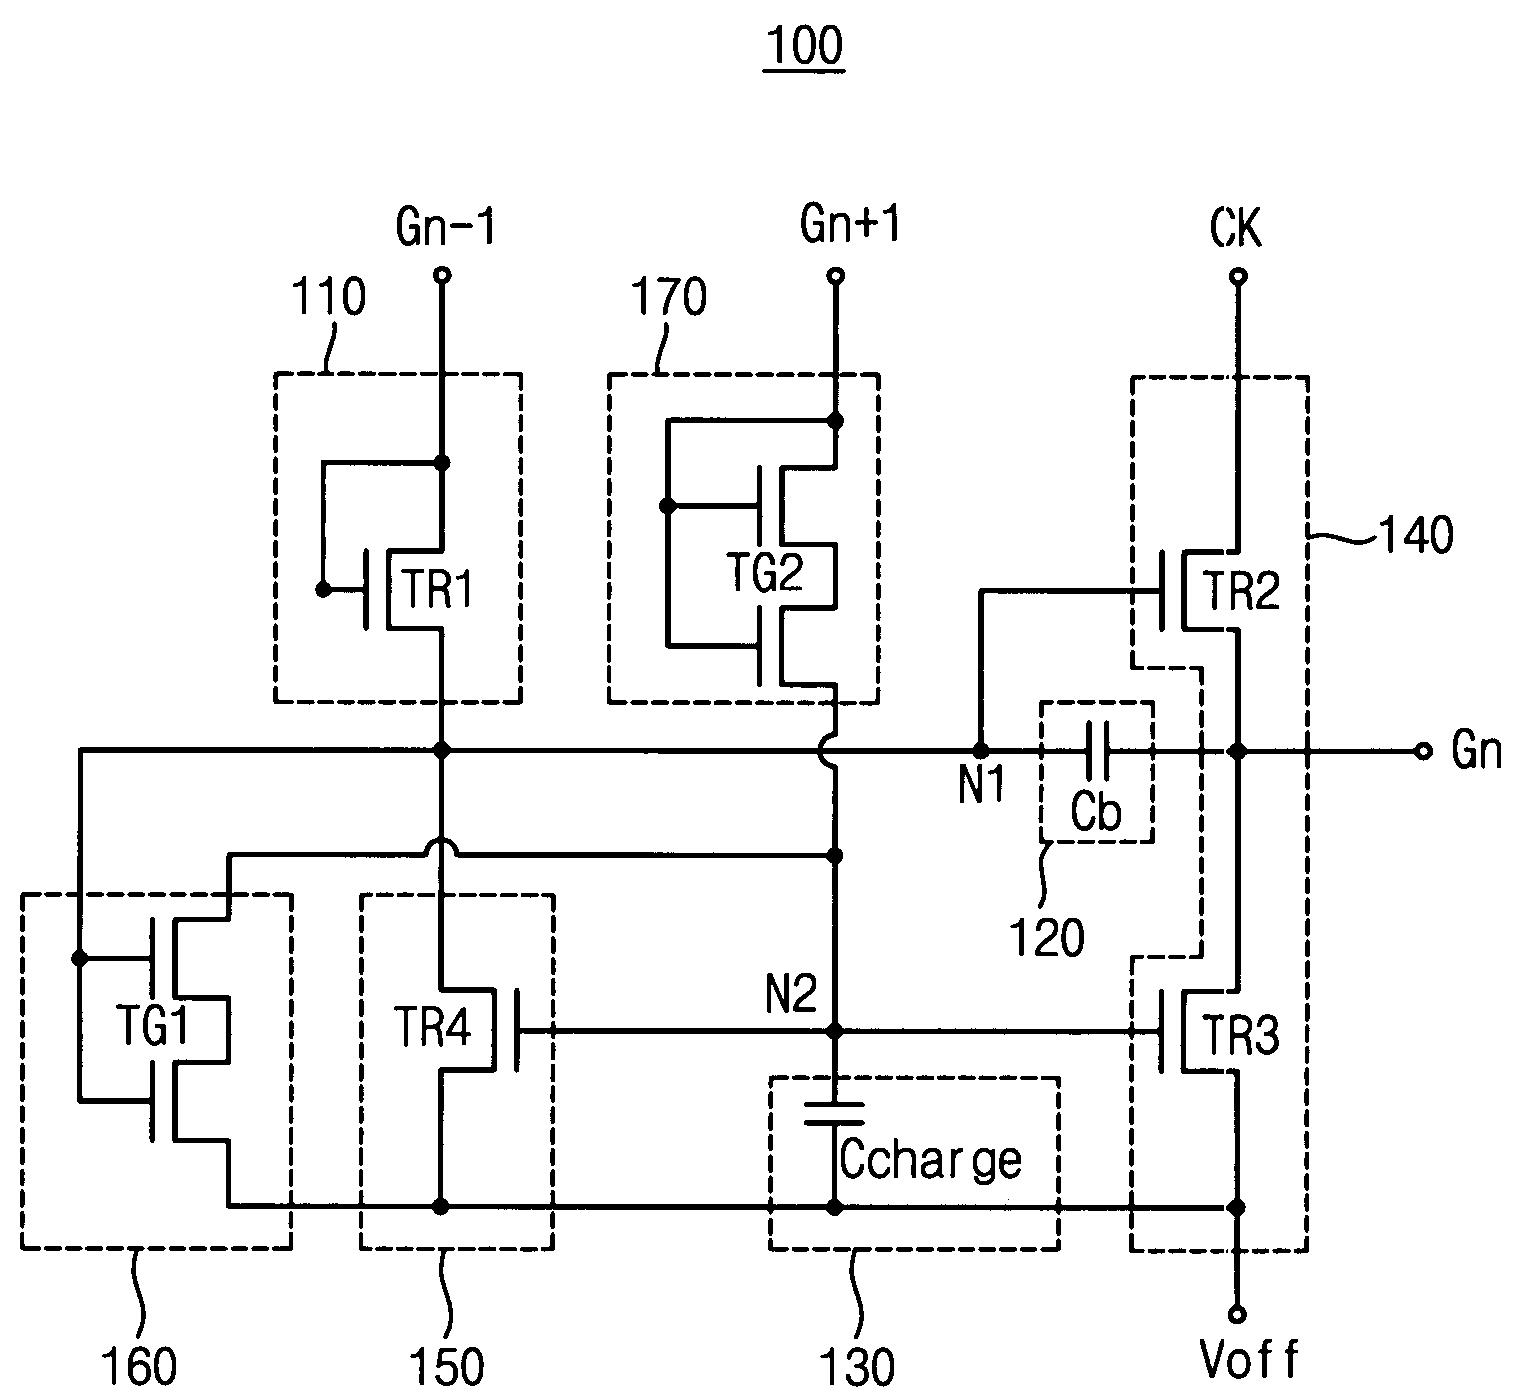 Brevet Us7250788 Shift Register Gate Driving Circuit And Display Diagram Patent Drawing